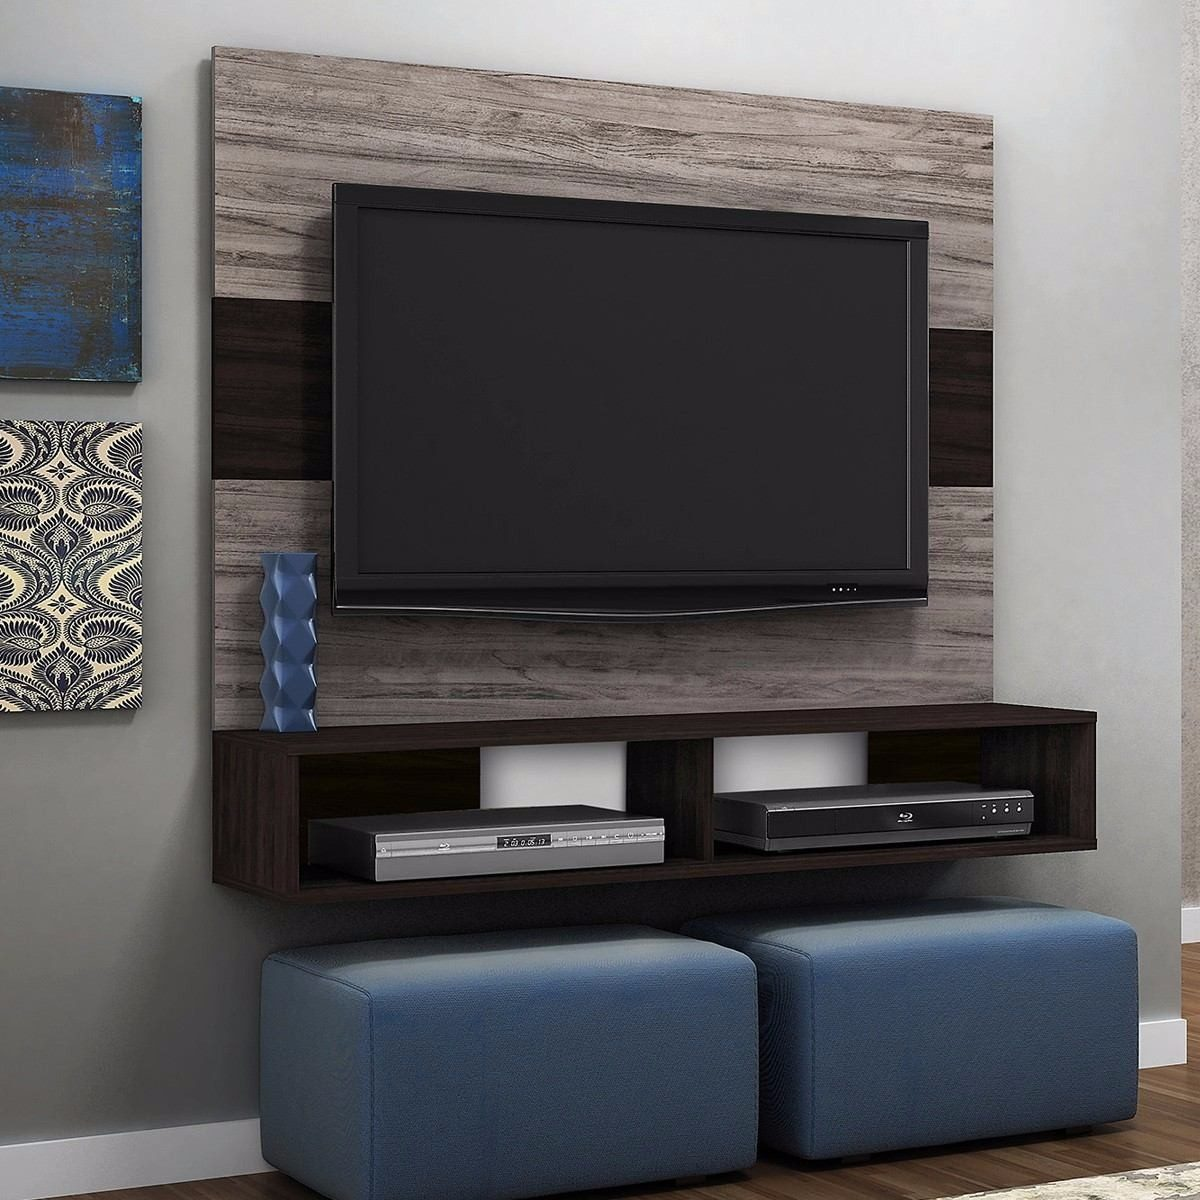 Mueble rack para tv centro de entretenimiento gratis for Mueble de entretenimiento